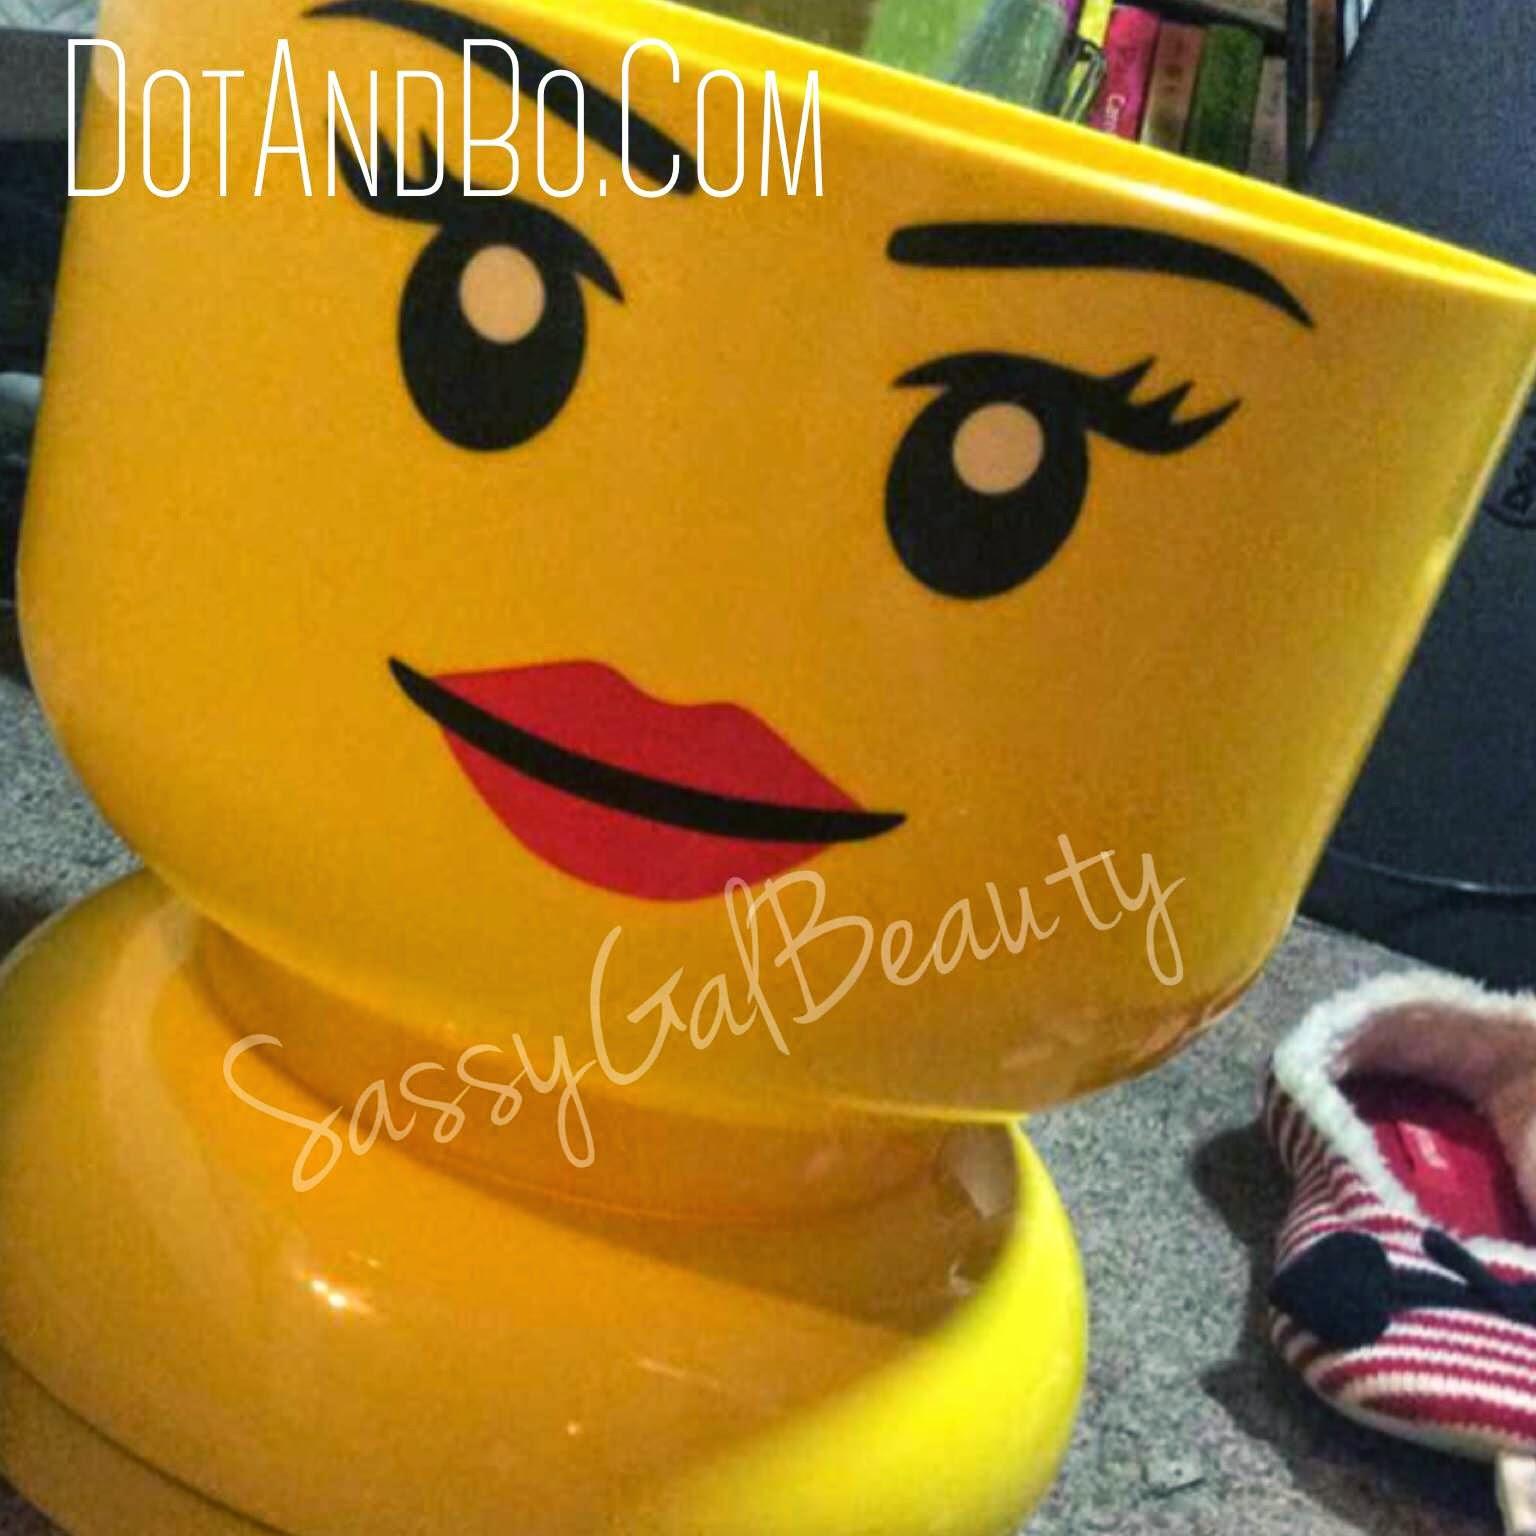 LegoHead from DotandBo.com